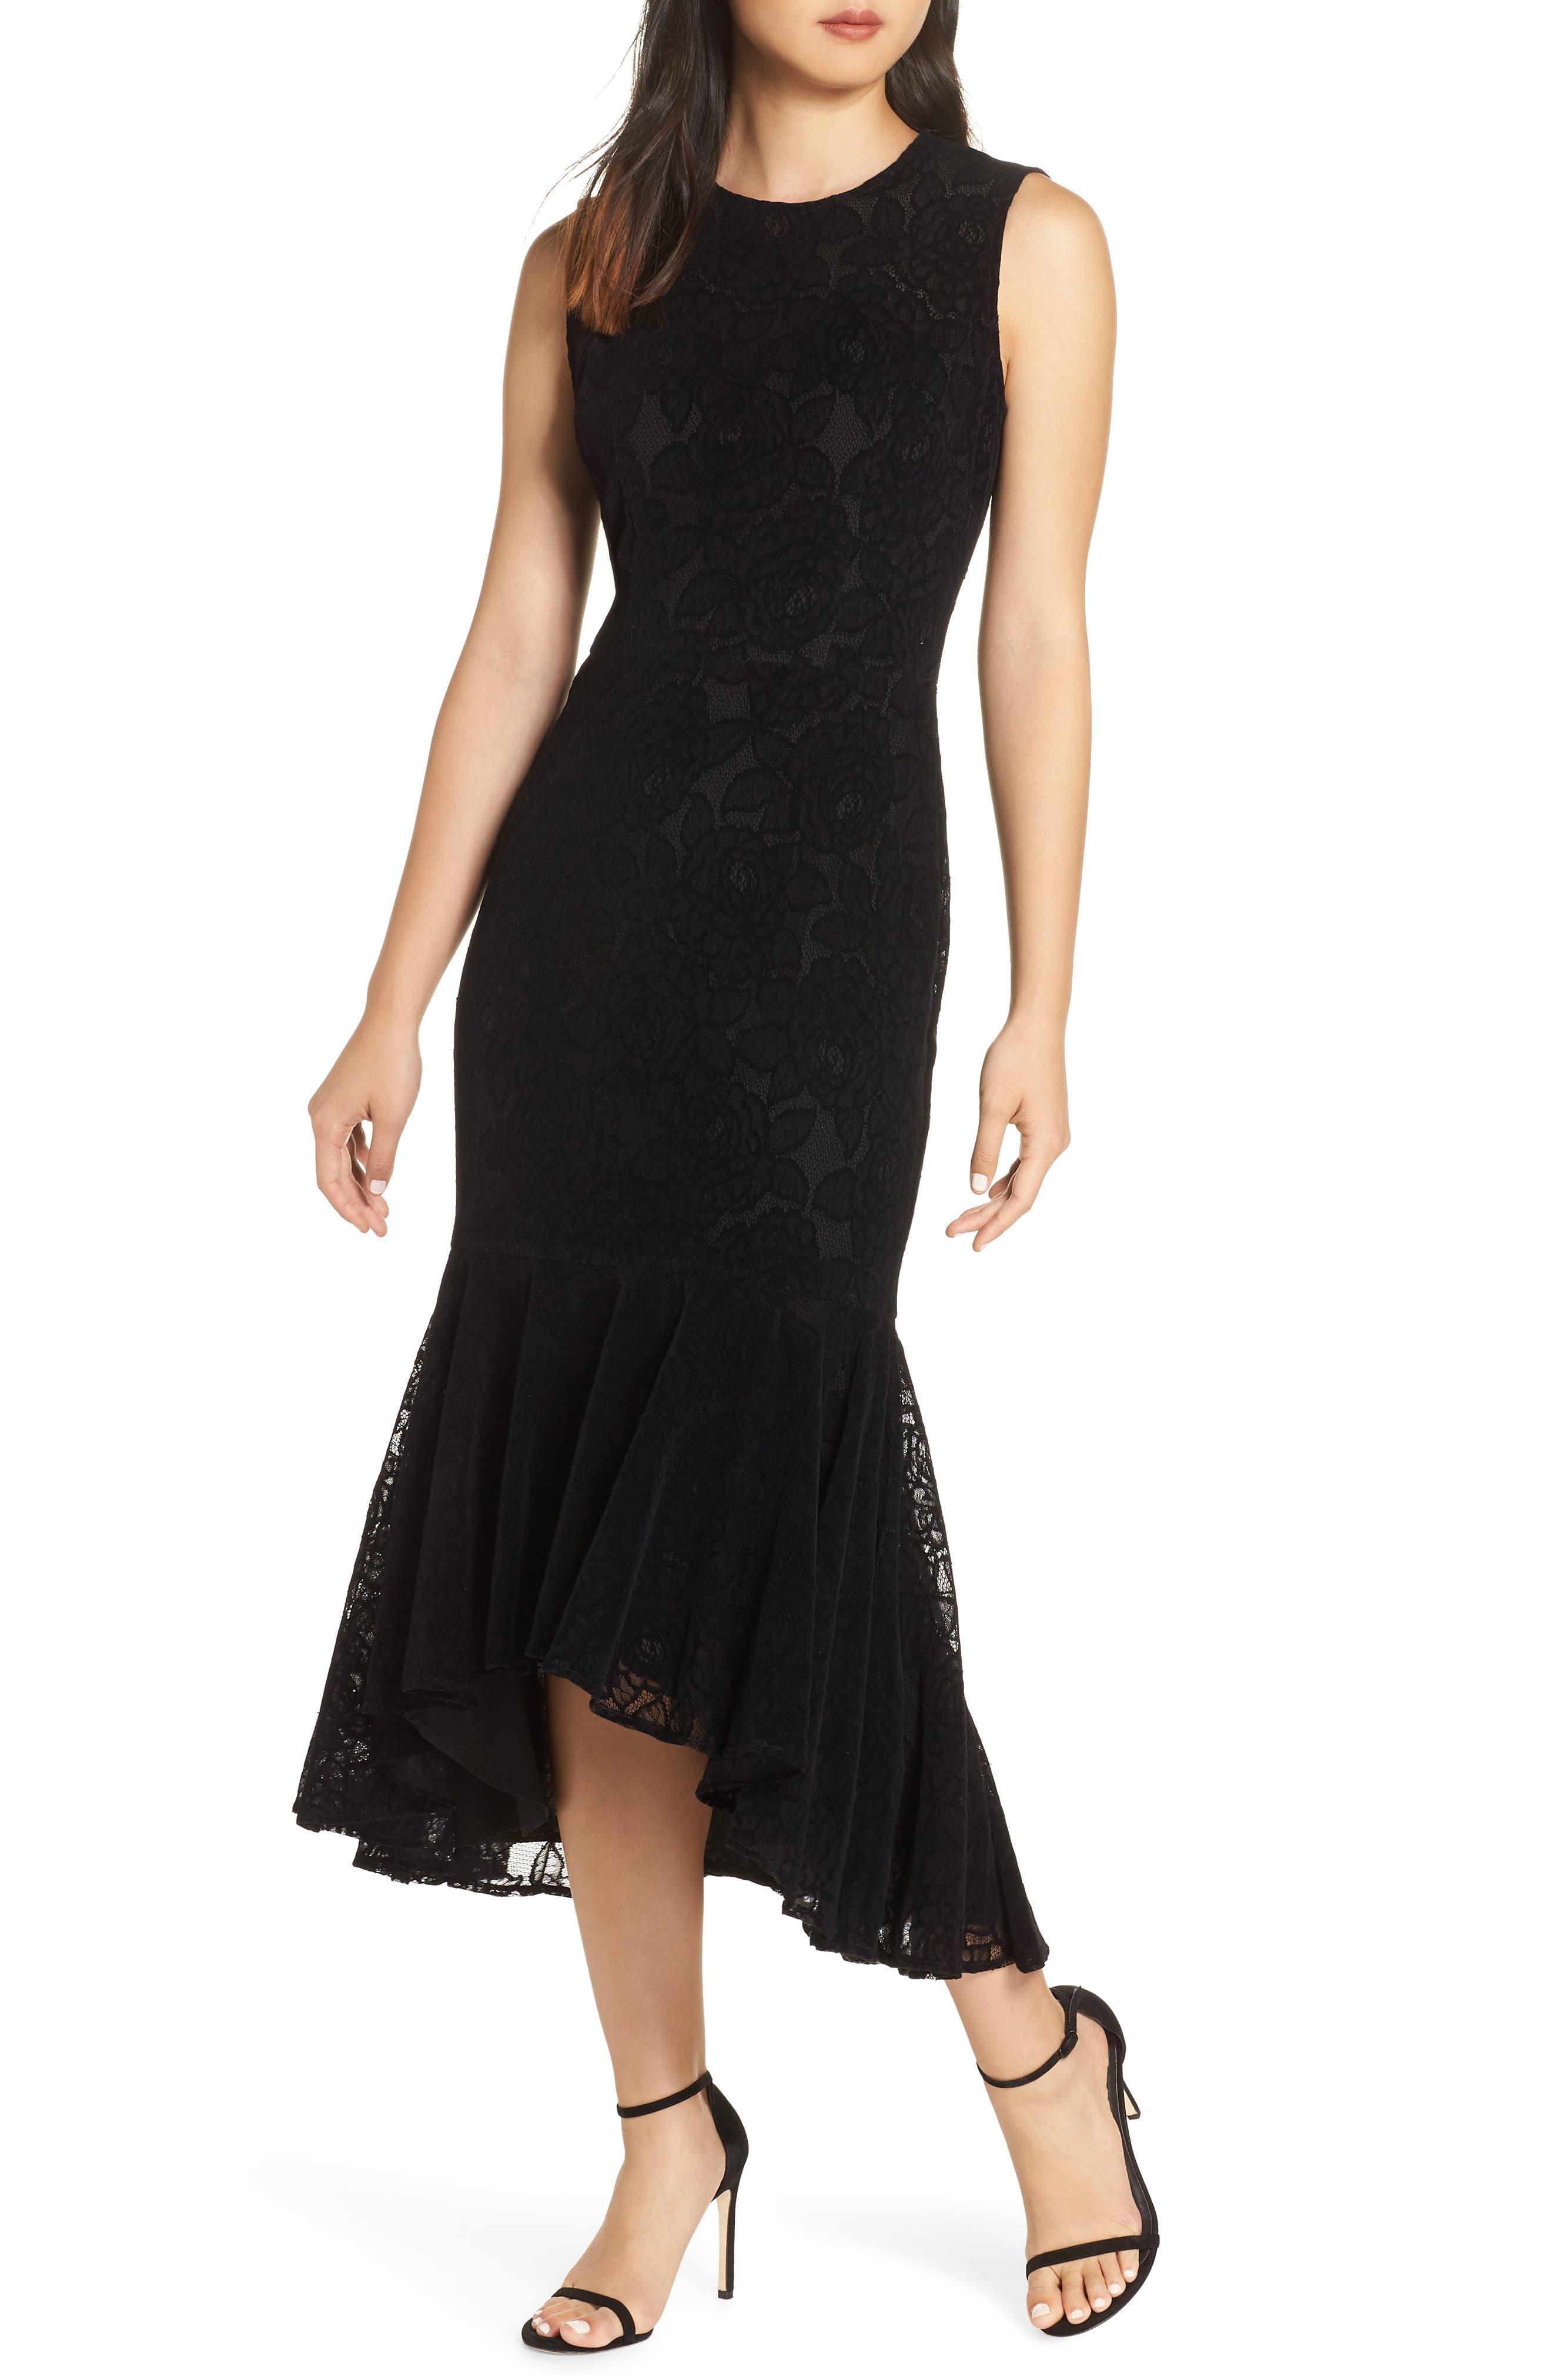 Maggy London Chantilly Velvet Lace Flounce Dress, Black